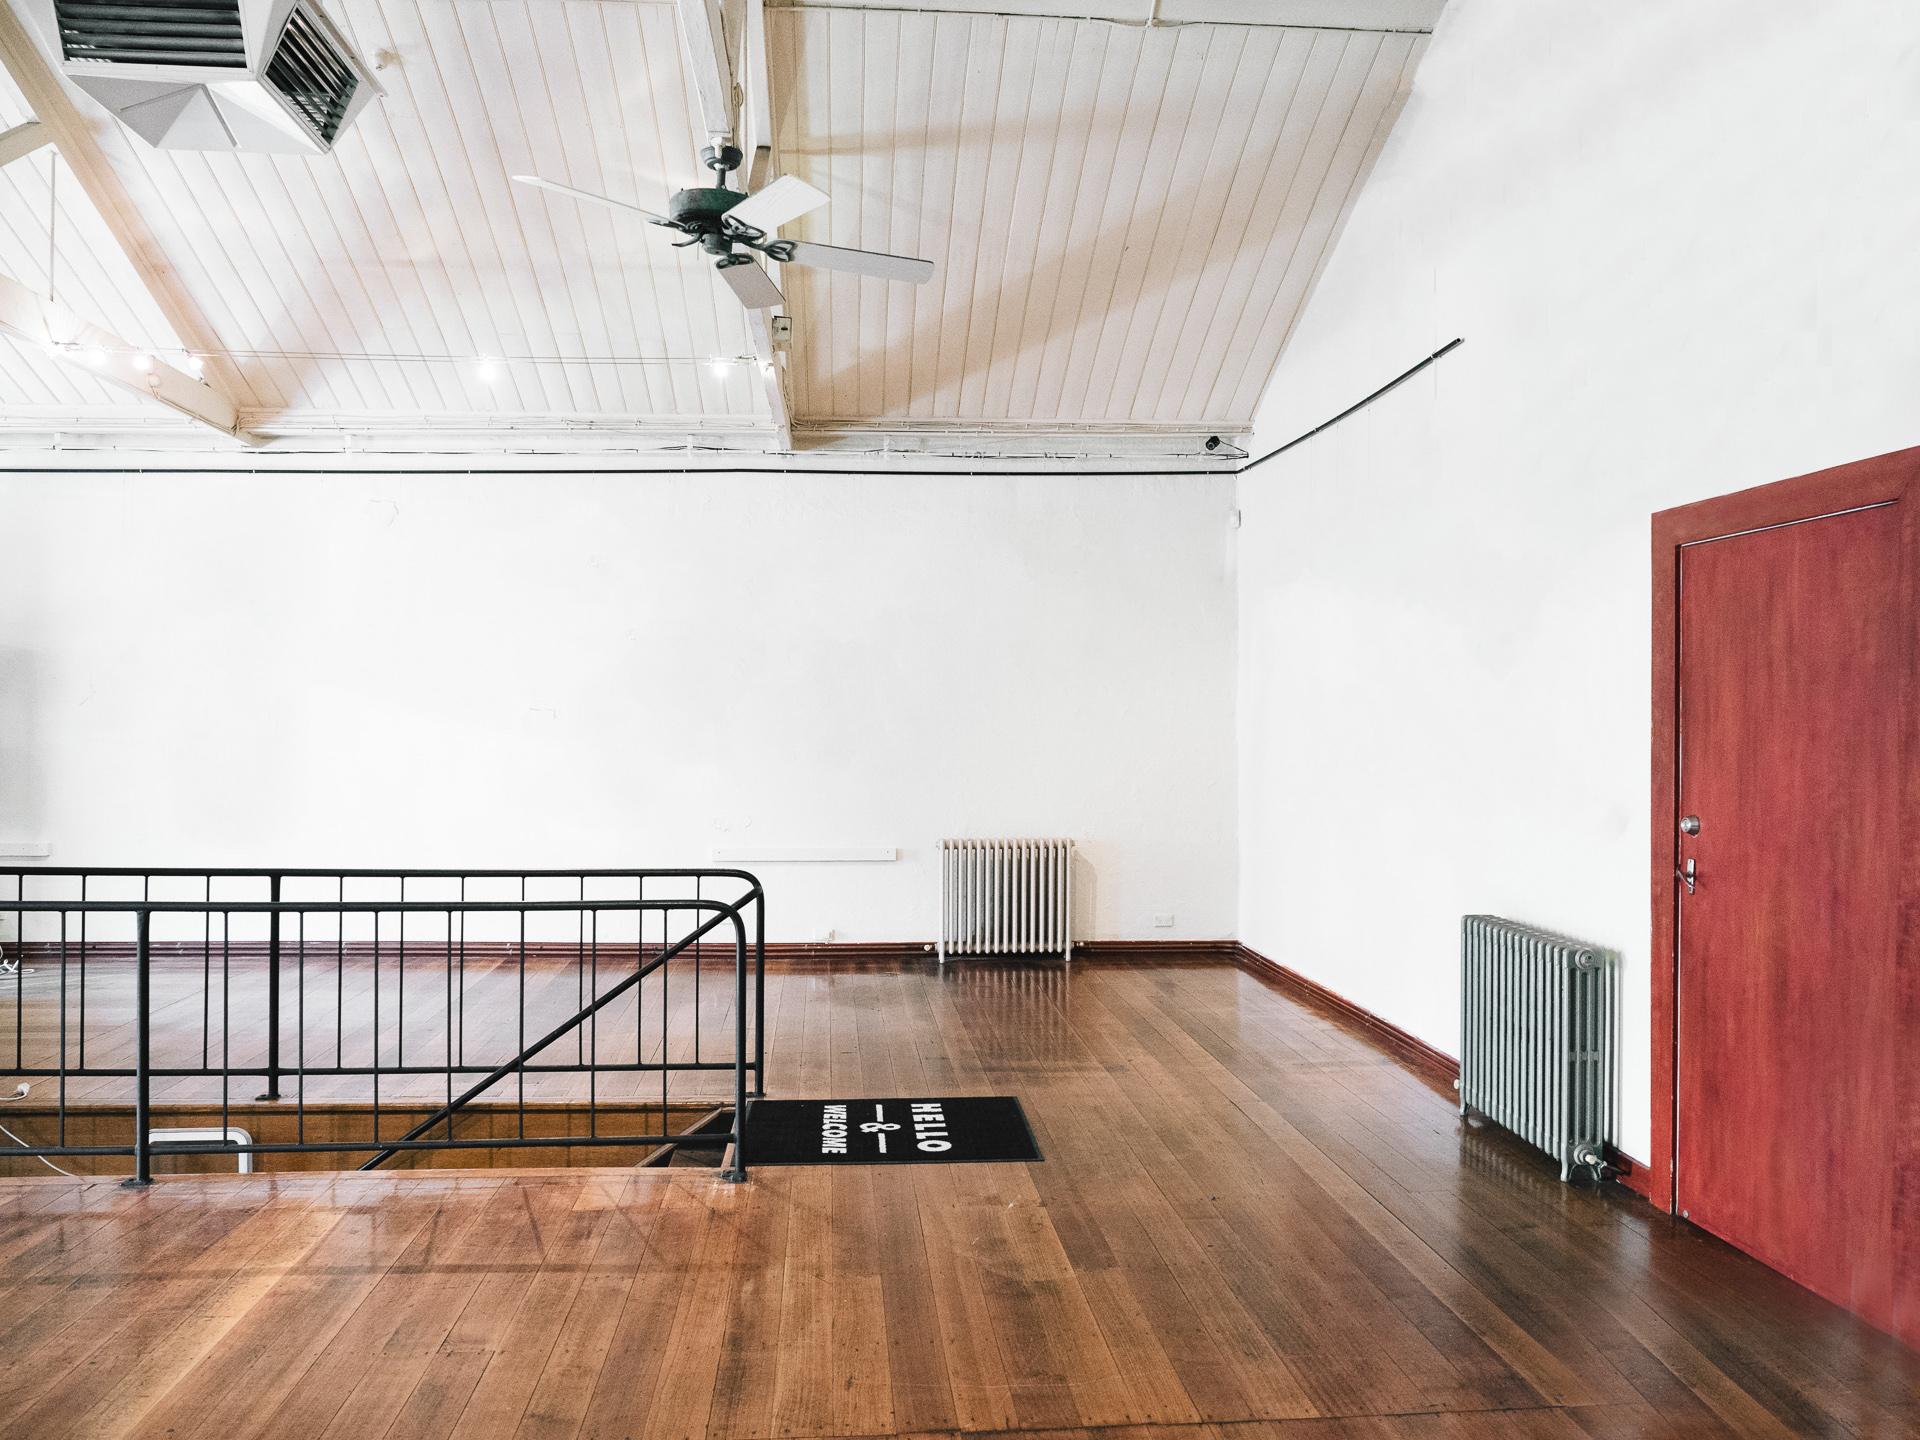 events-space-gallery-room-1-04.jpg